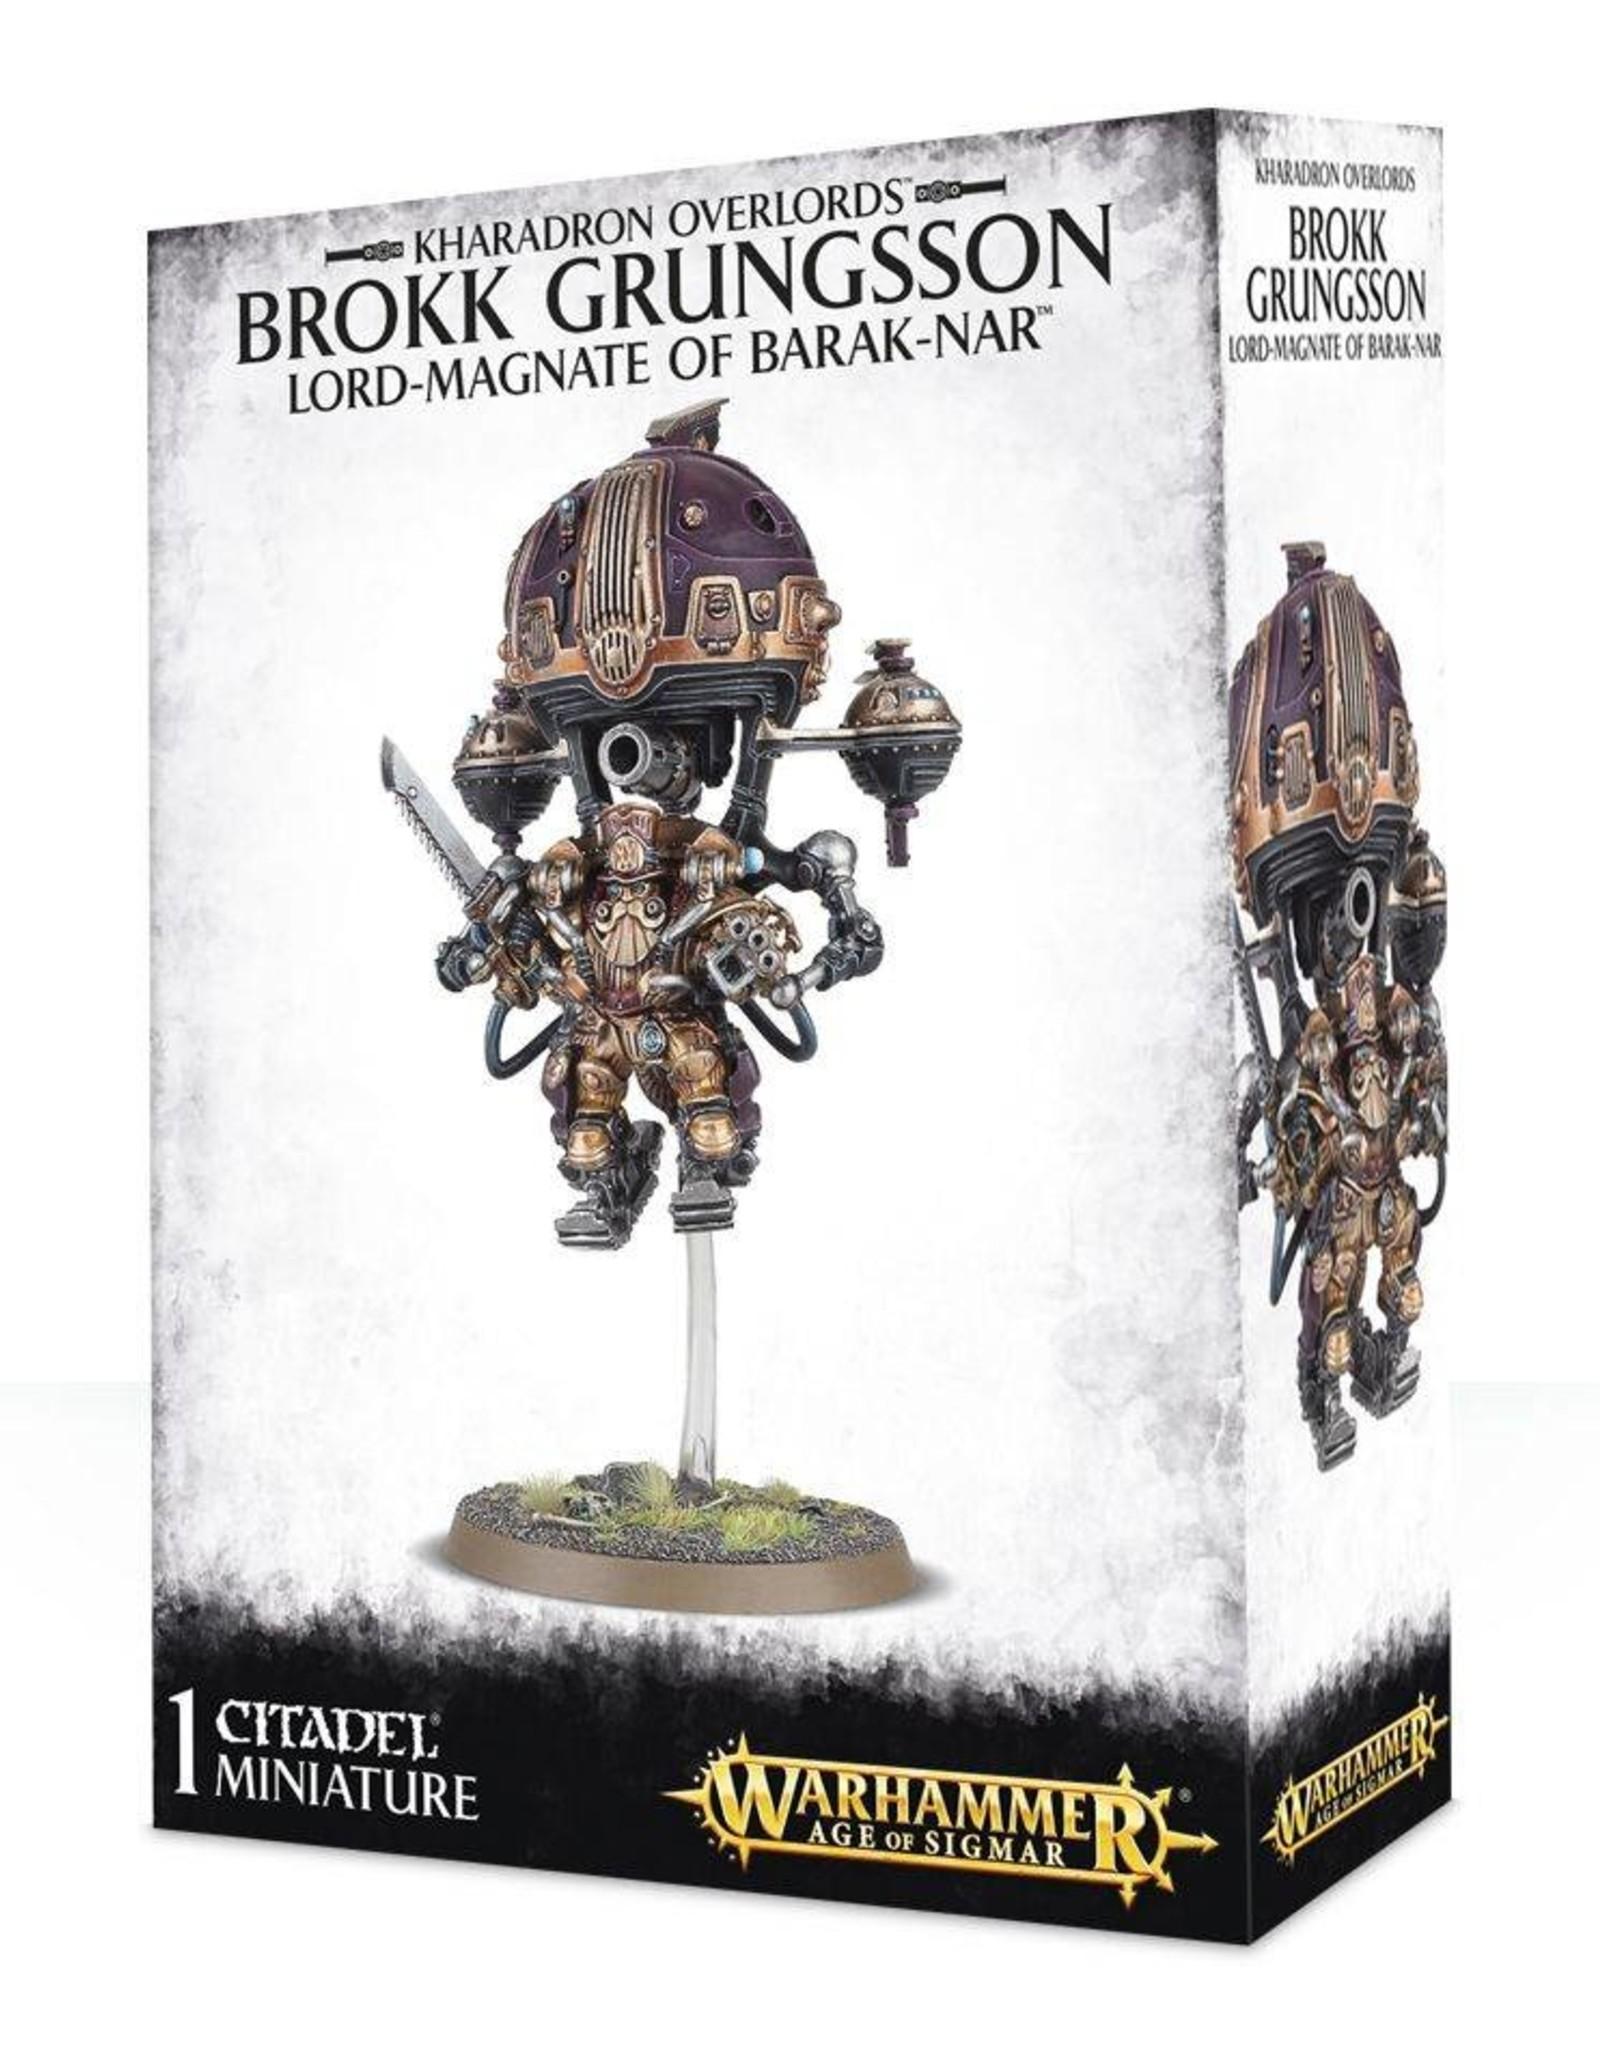 Games Workshop Kharadron Overlords Brokk Grungsson. Lord-Magnate Barak-Nar